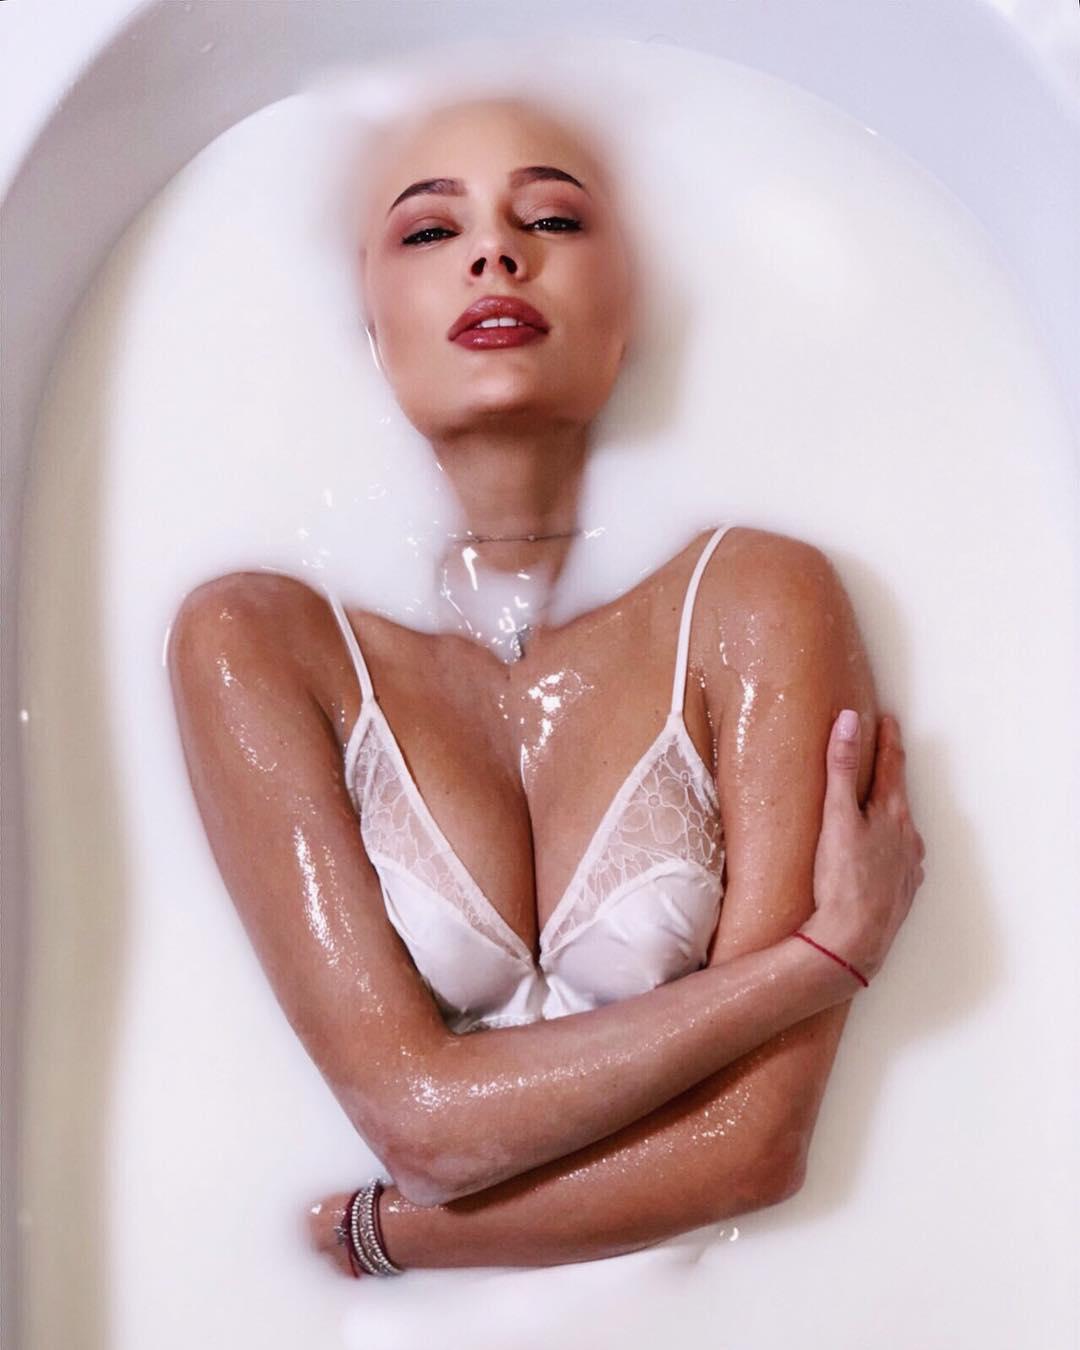 Наталья Рудова: Привет.Меня зовут Лилу, и я- Пятый Элемент.#FifthElement #5thelement #lilu #pure #beauty